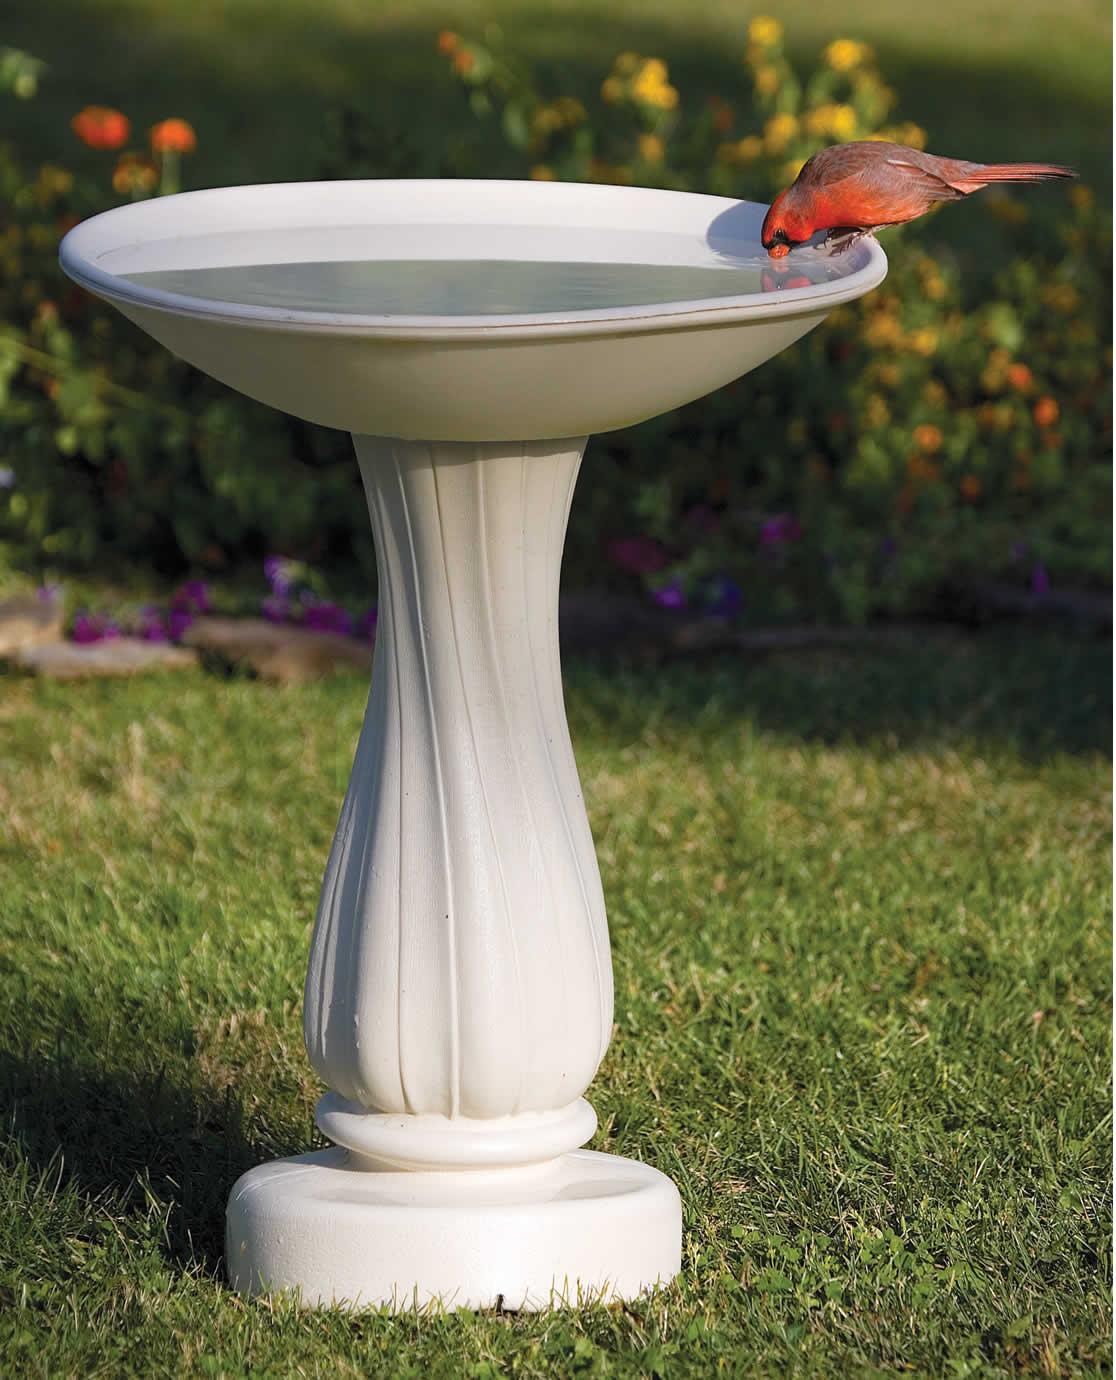 Duncraftcom AllSeasons Heated Bird Bath